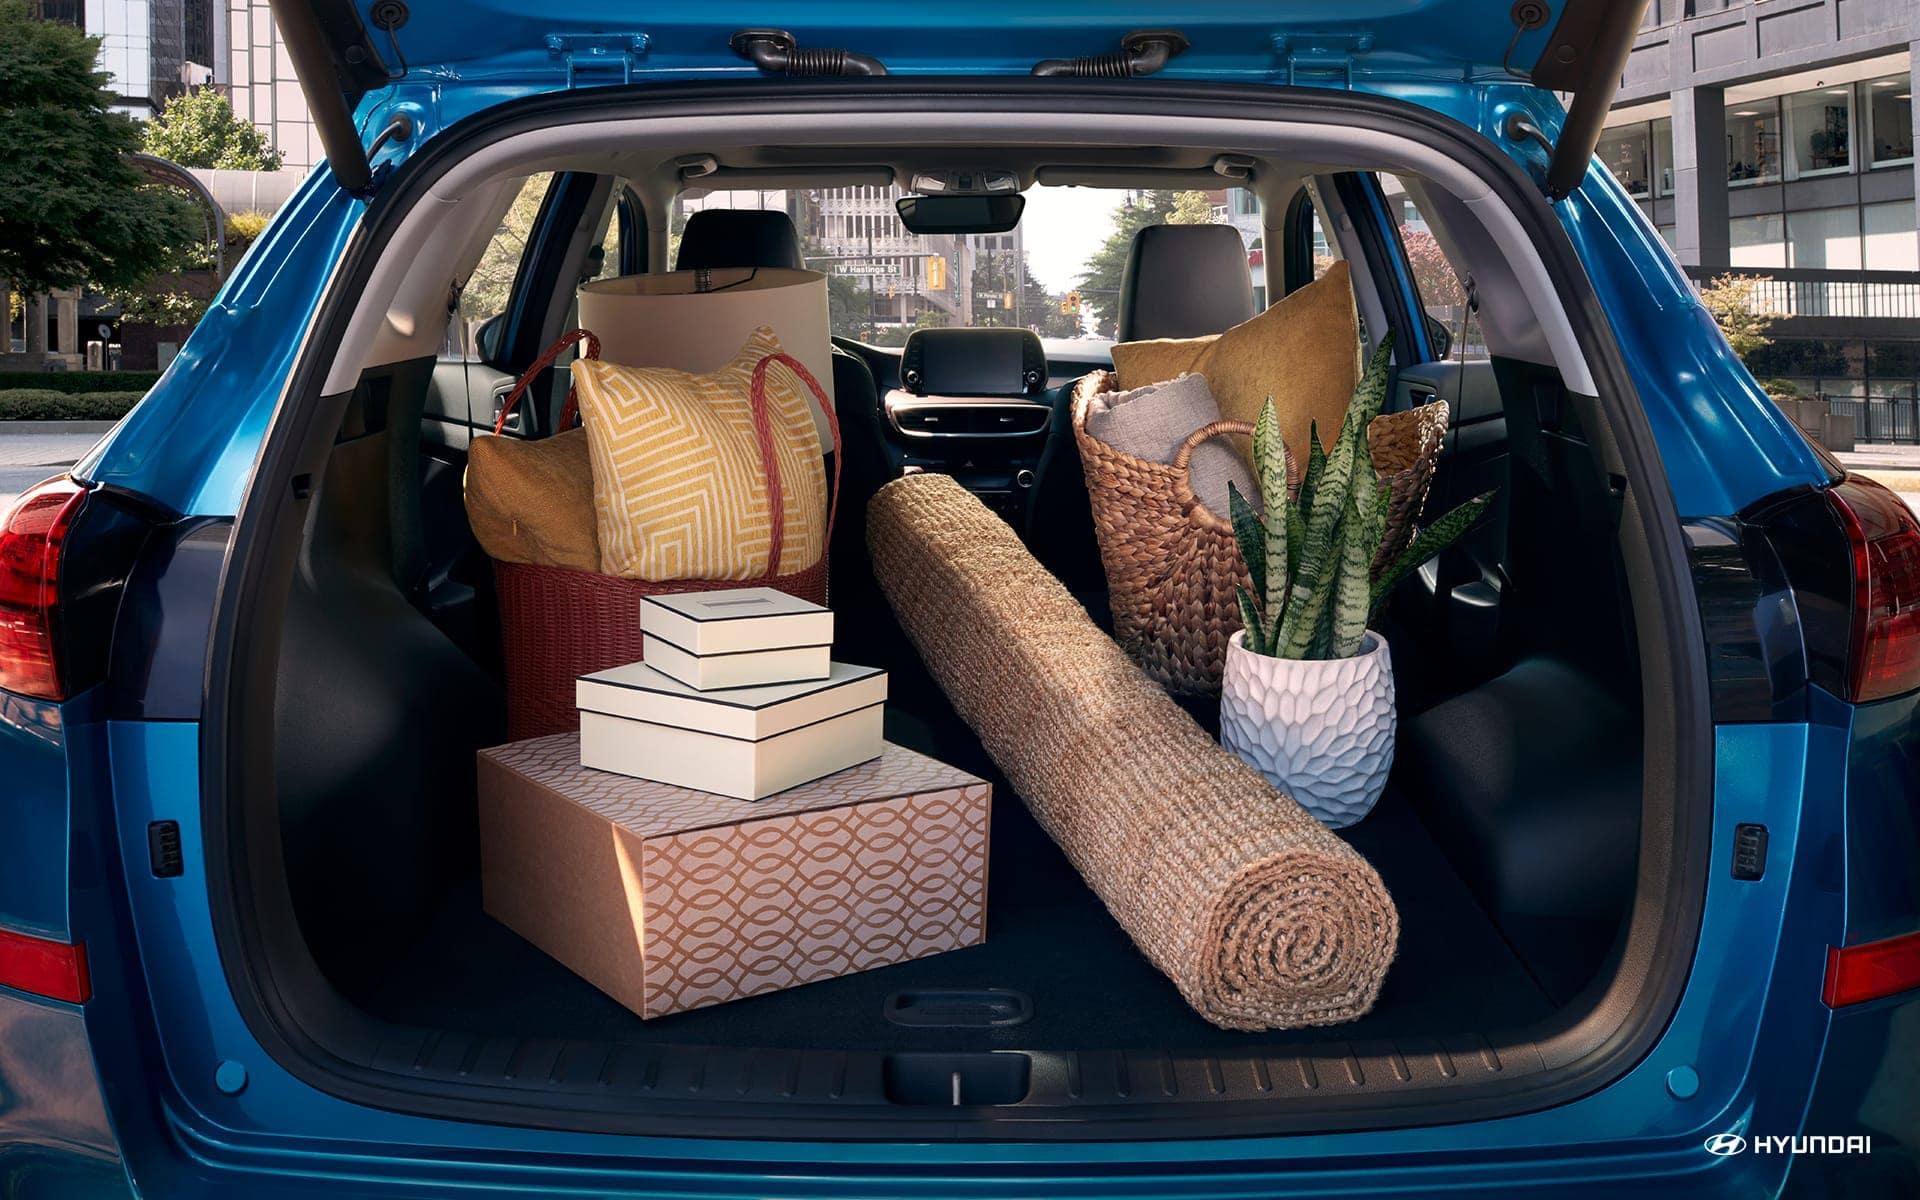 Storage in the 2019 Hyundai Tucson